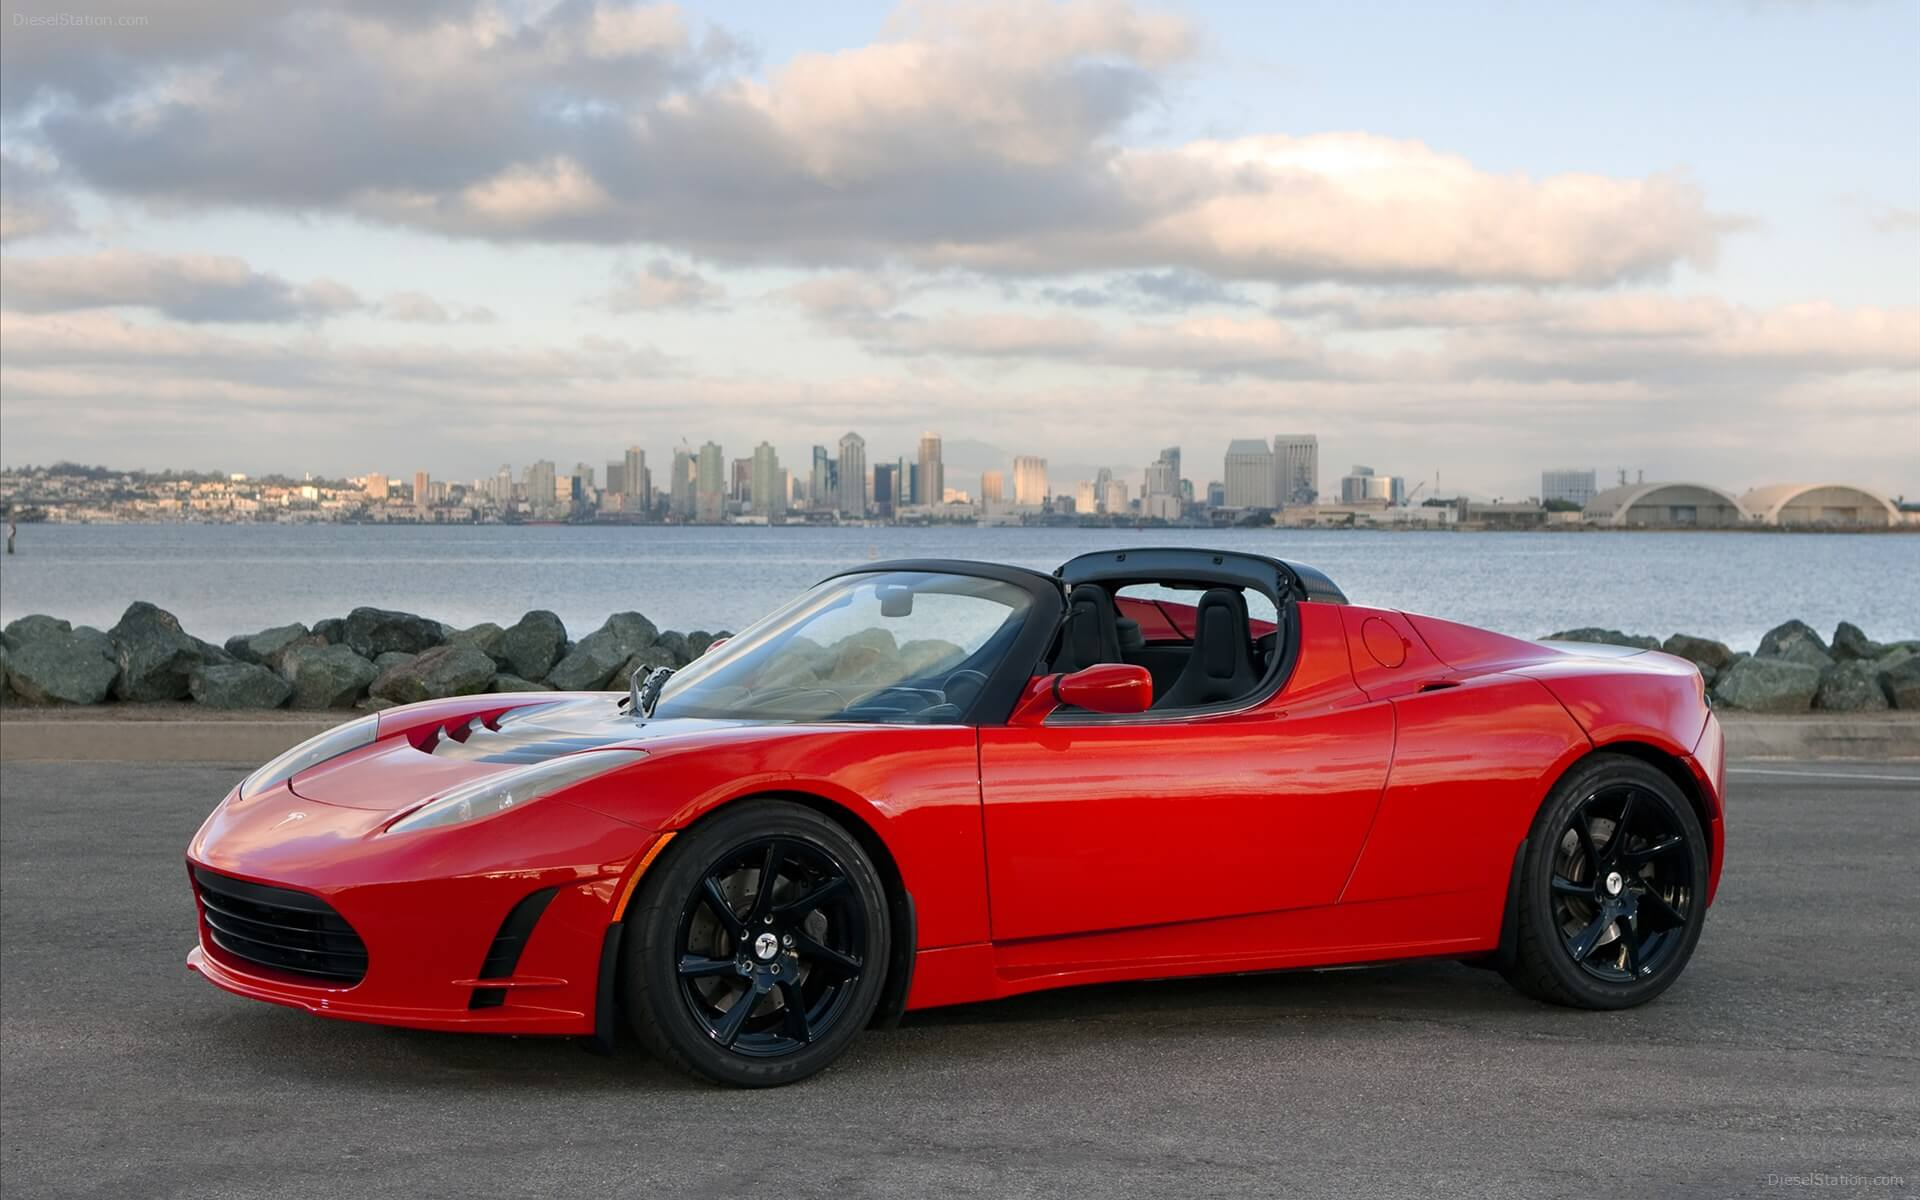 Tesla Roadster © tesla.com